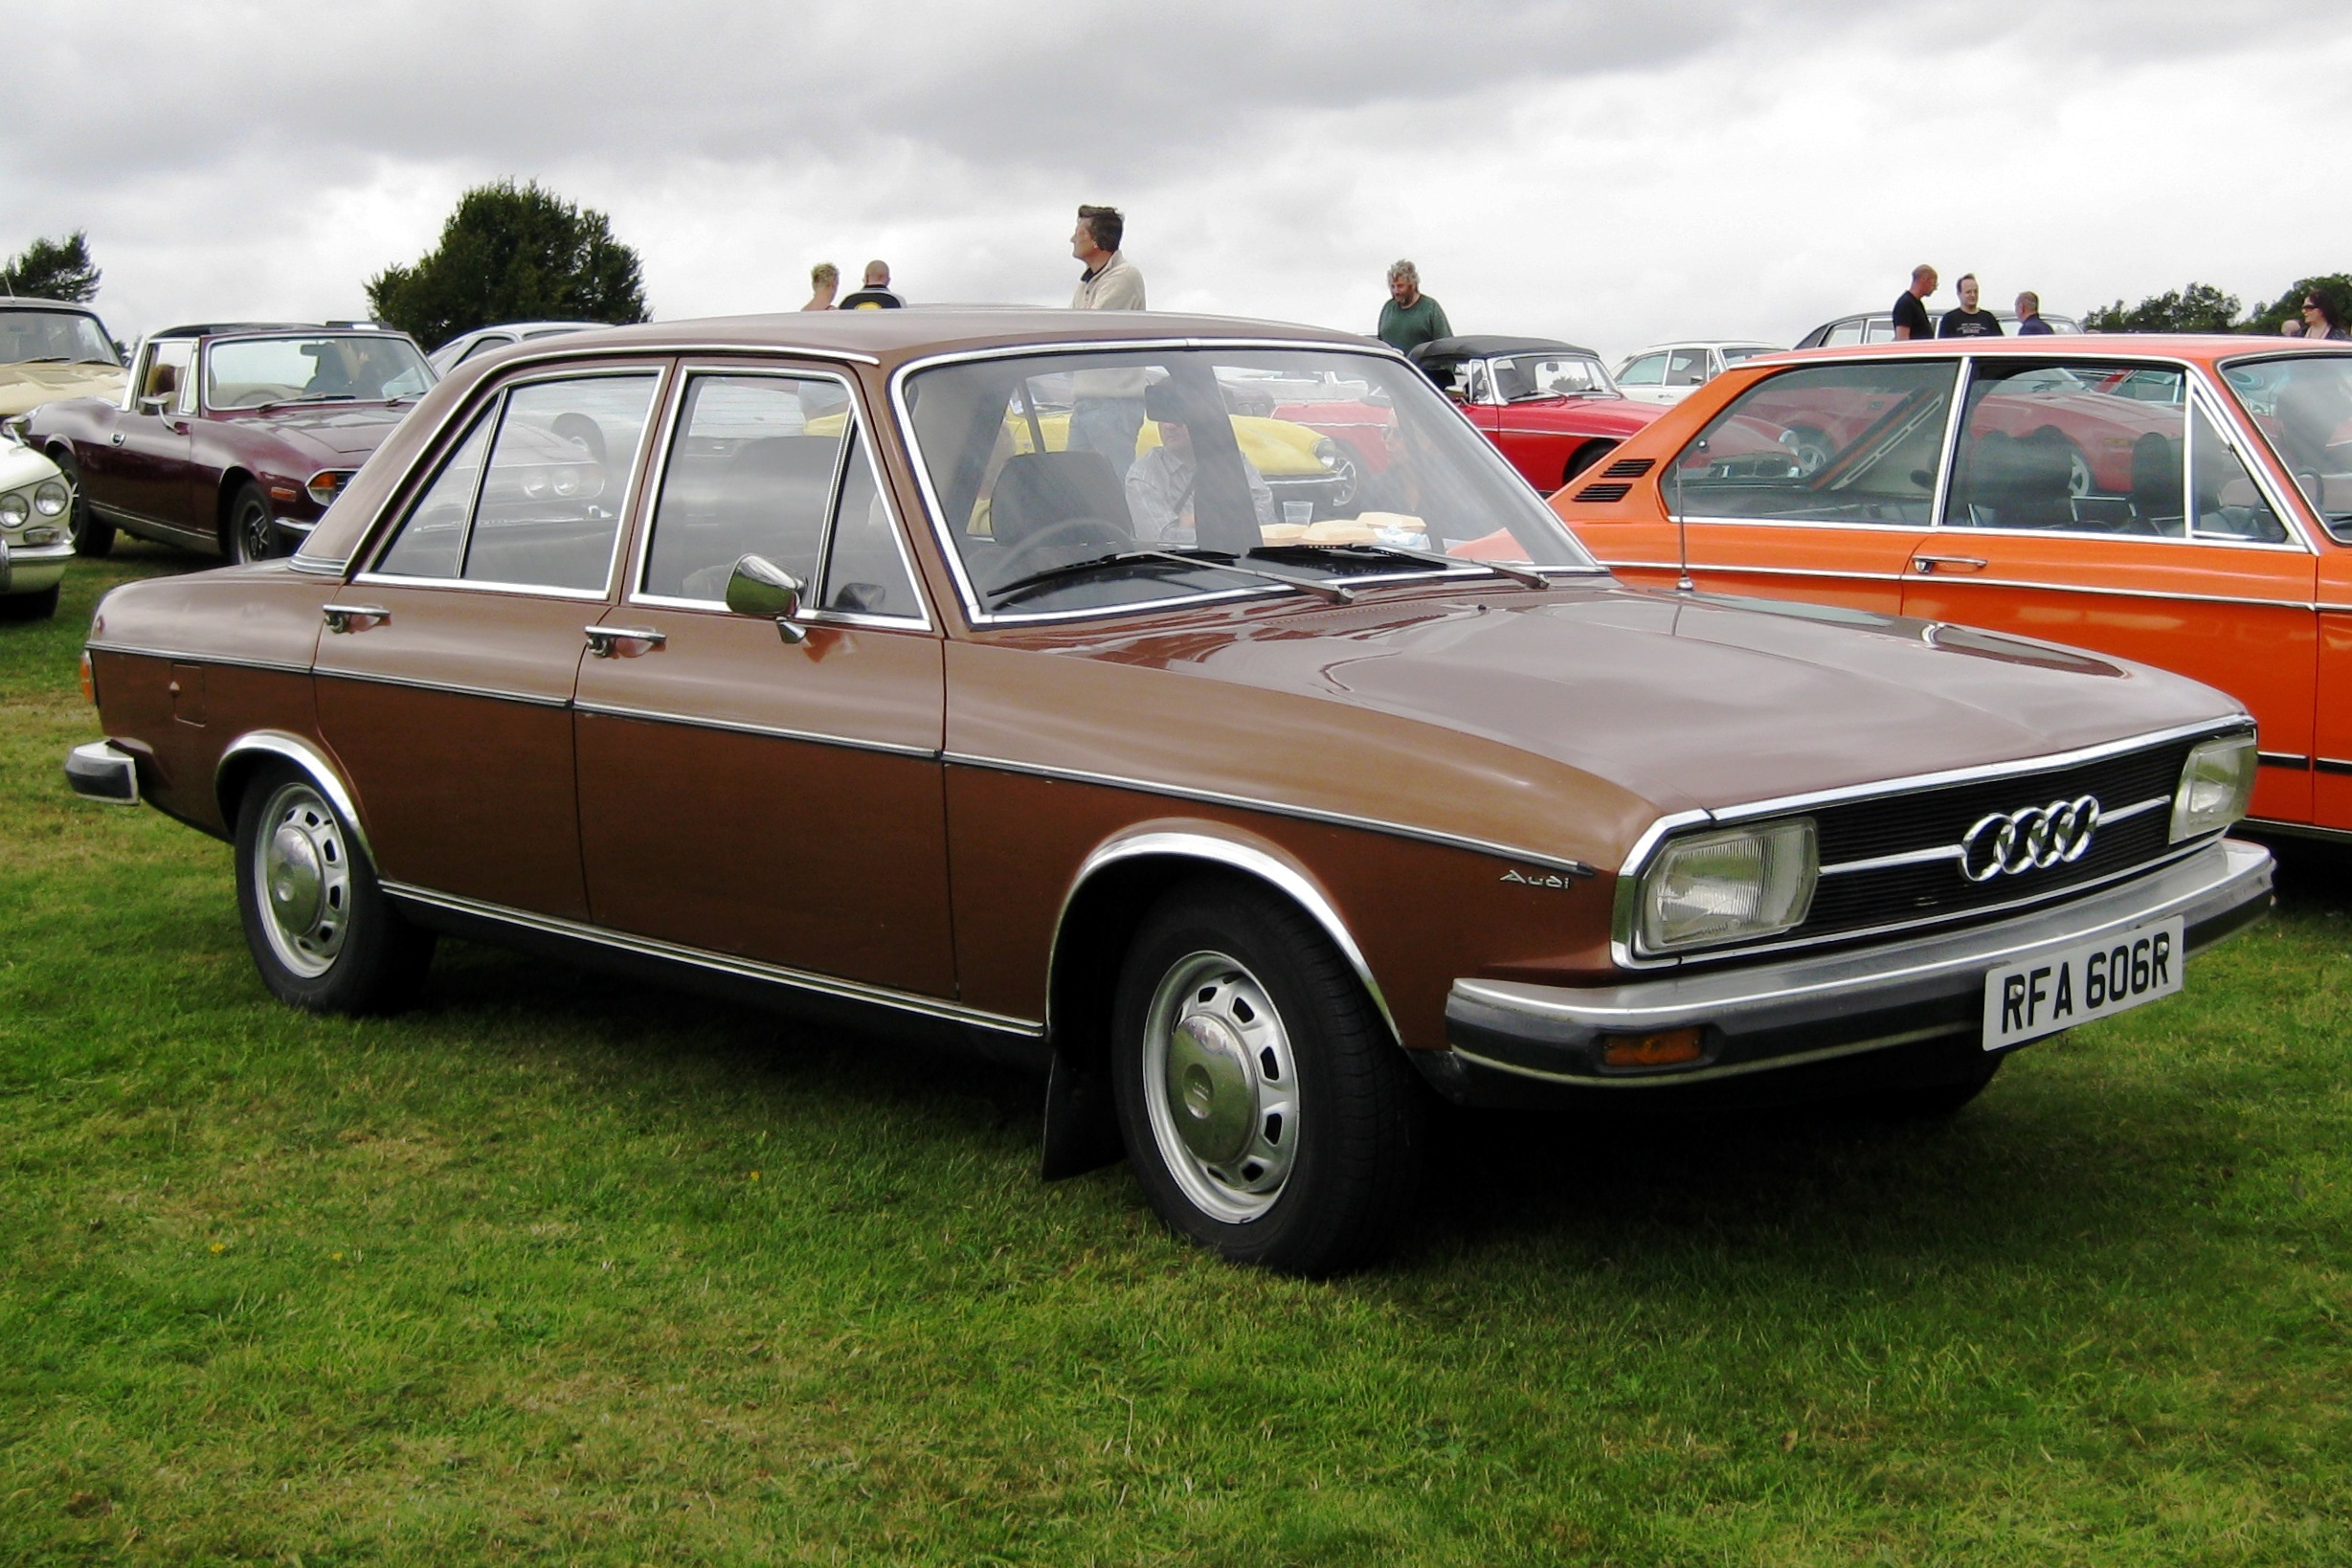 File:Audi 100LS C1 1761cc first registered November 1976.JPG - Wikimedia Commons